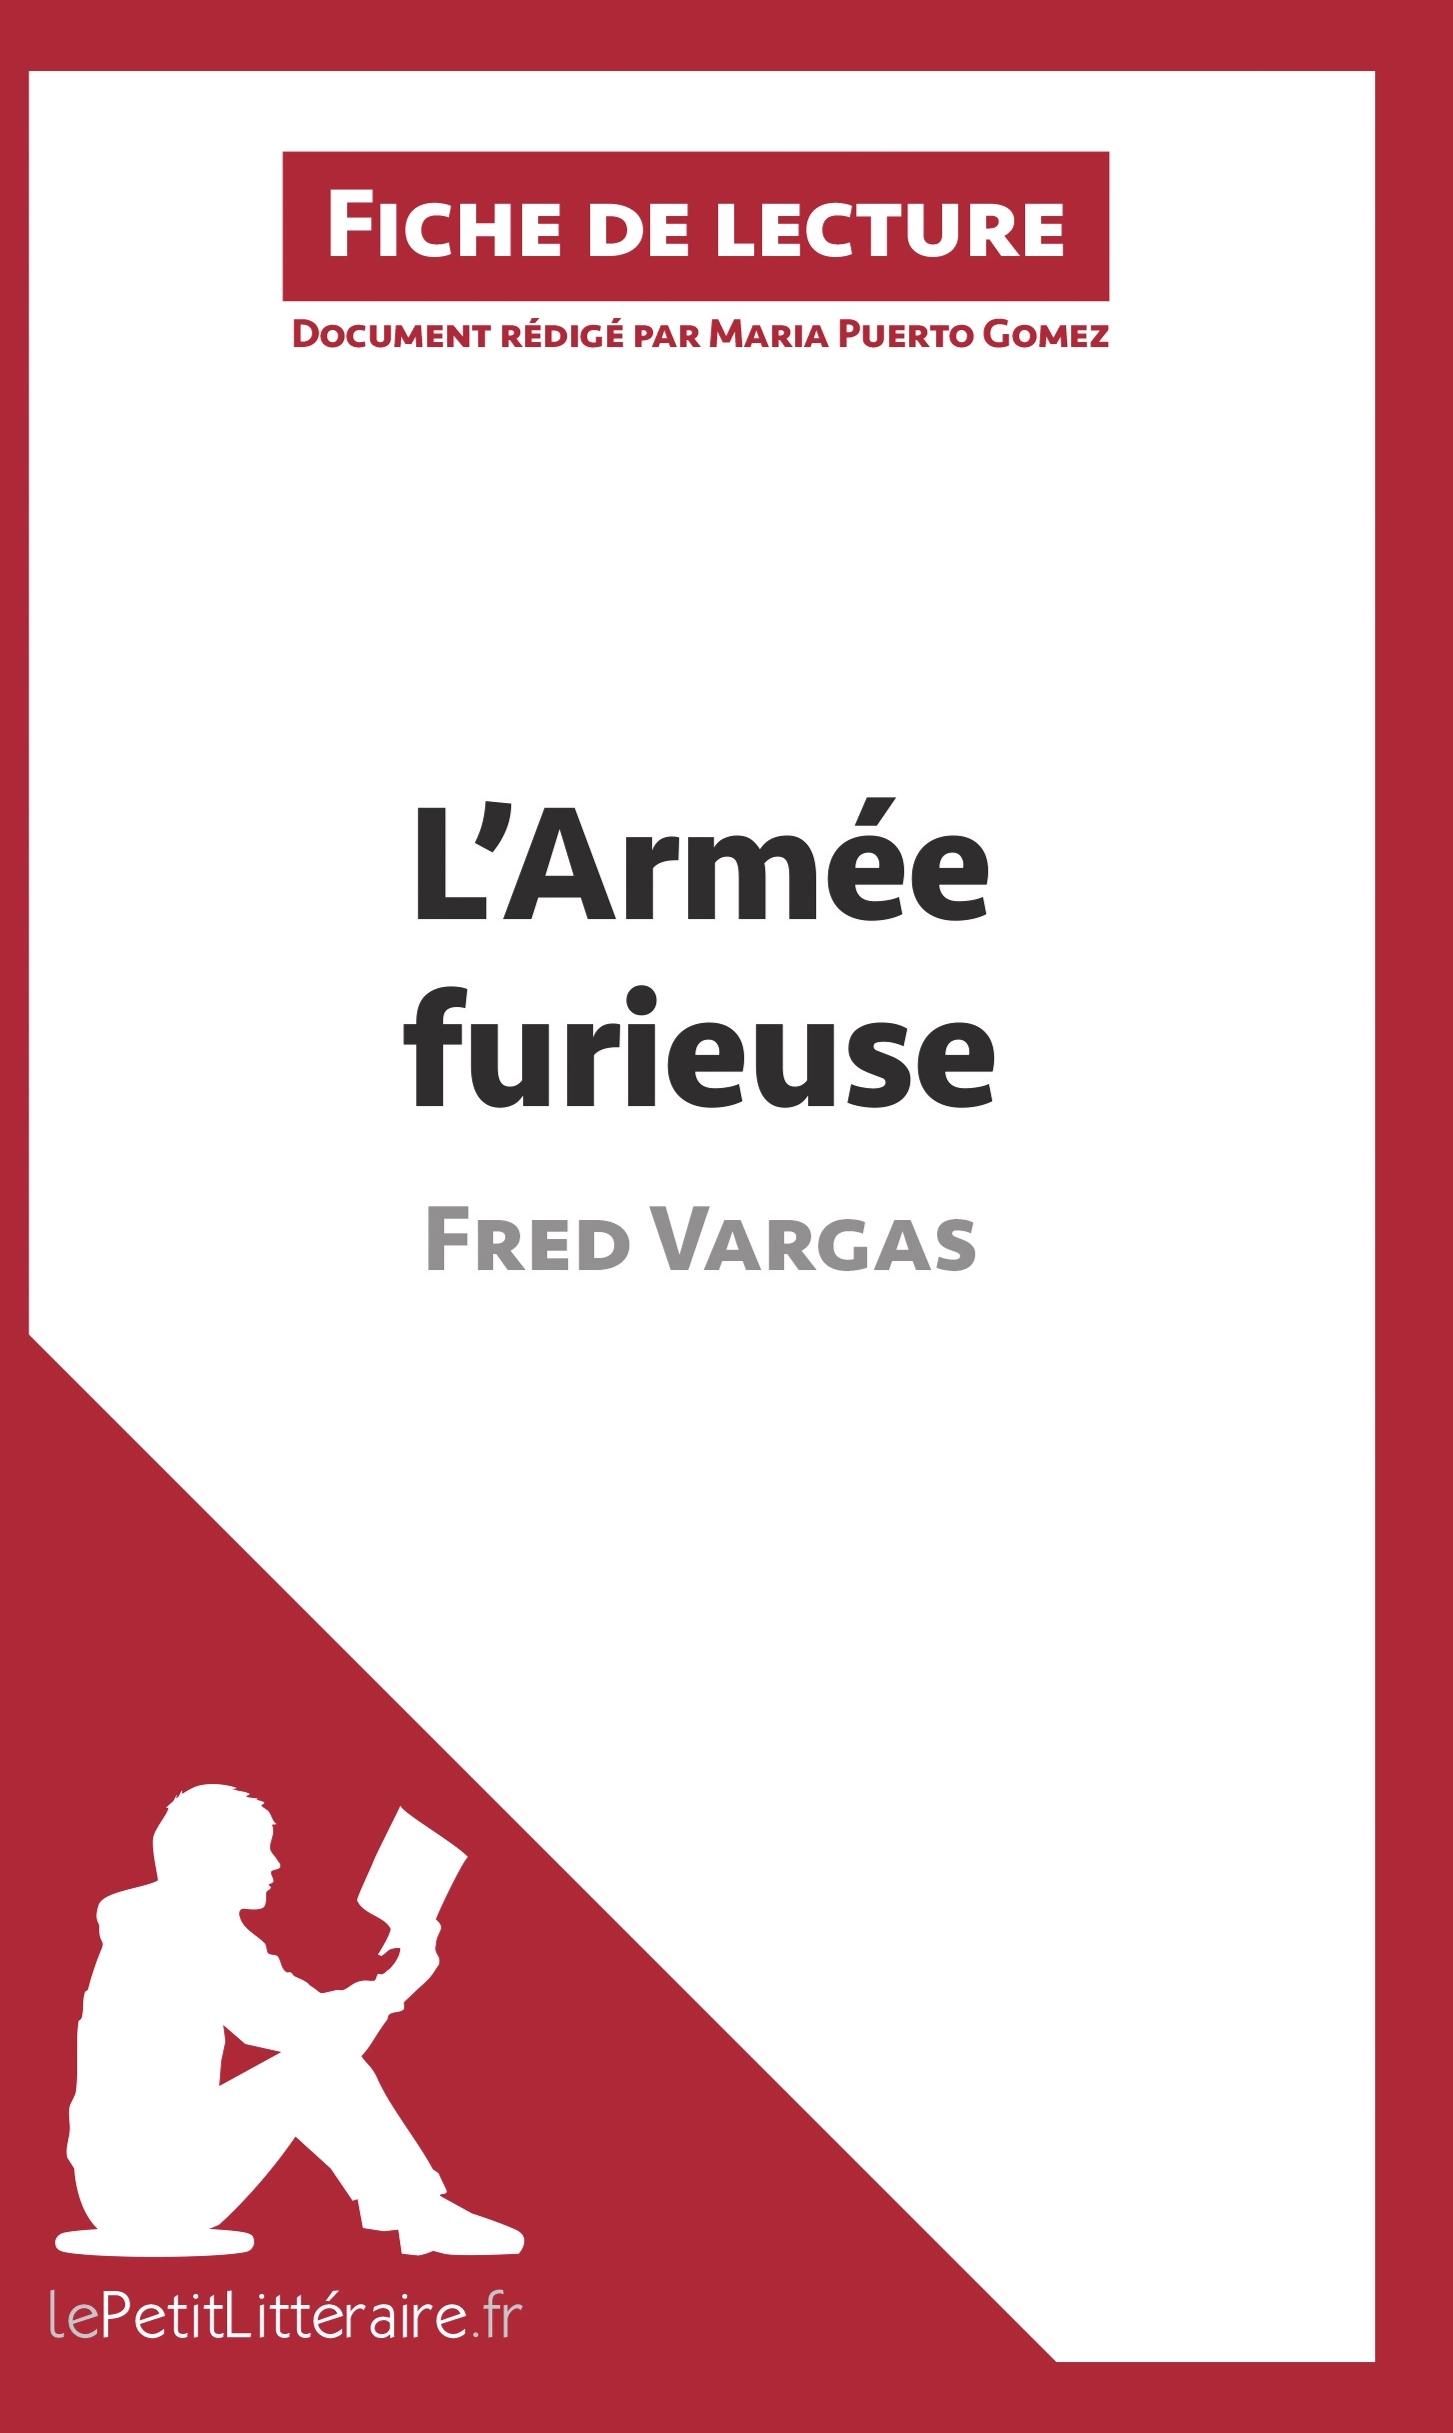 ANALYSE L ARMEE FURIEUSE DE FRED VARGAS ANALYSE COMPLETE DE L UVRE ET RESUME